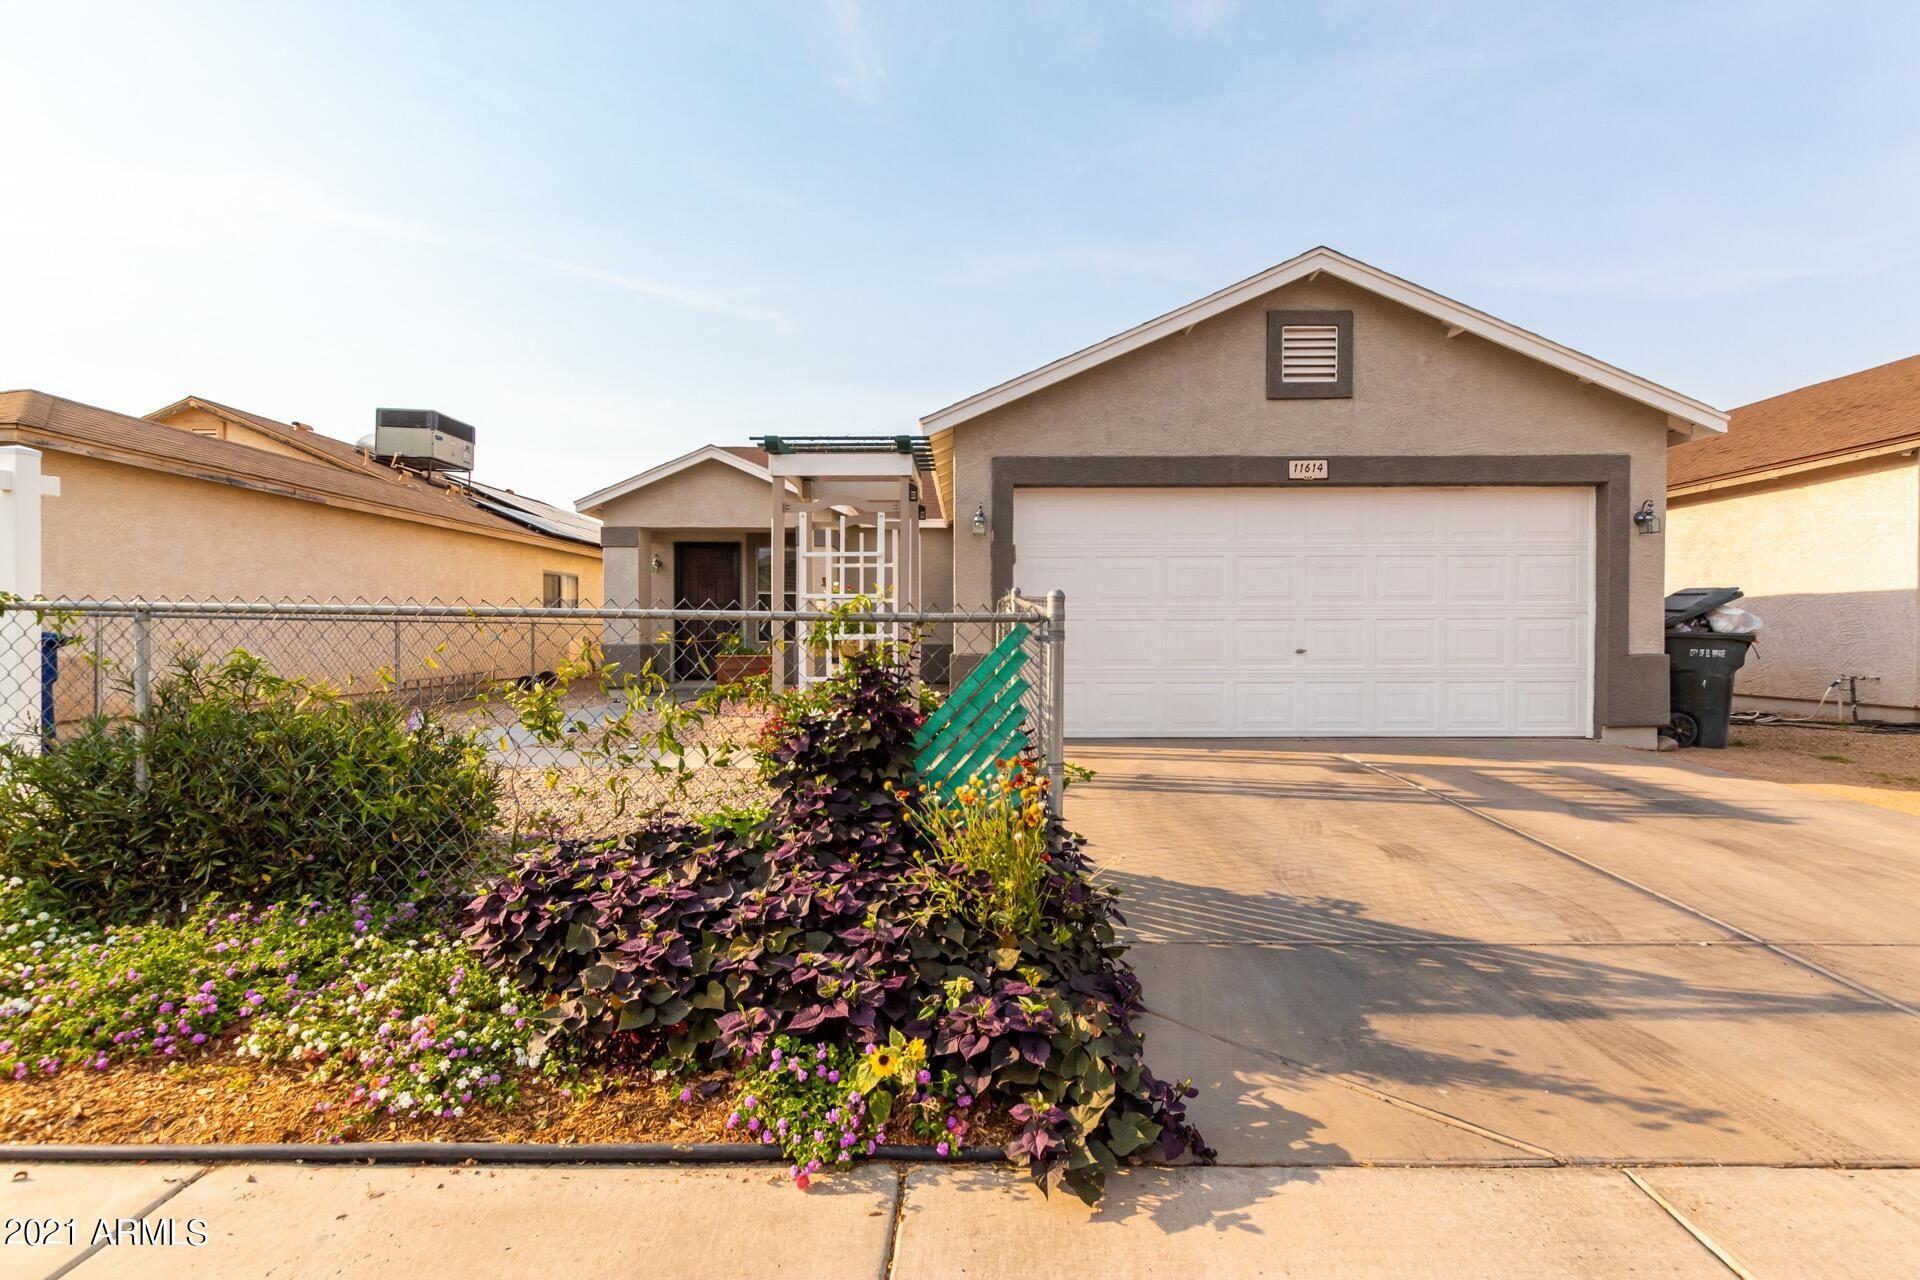 11614 W BLOOMFIELD Road, El Mirage, AZ 85335 - MLS#: 6248697